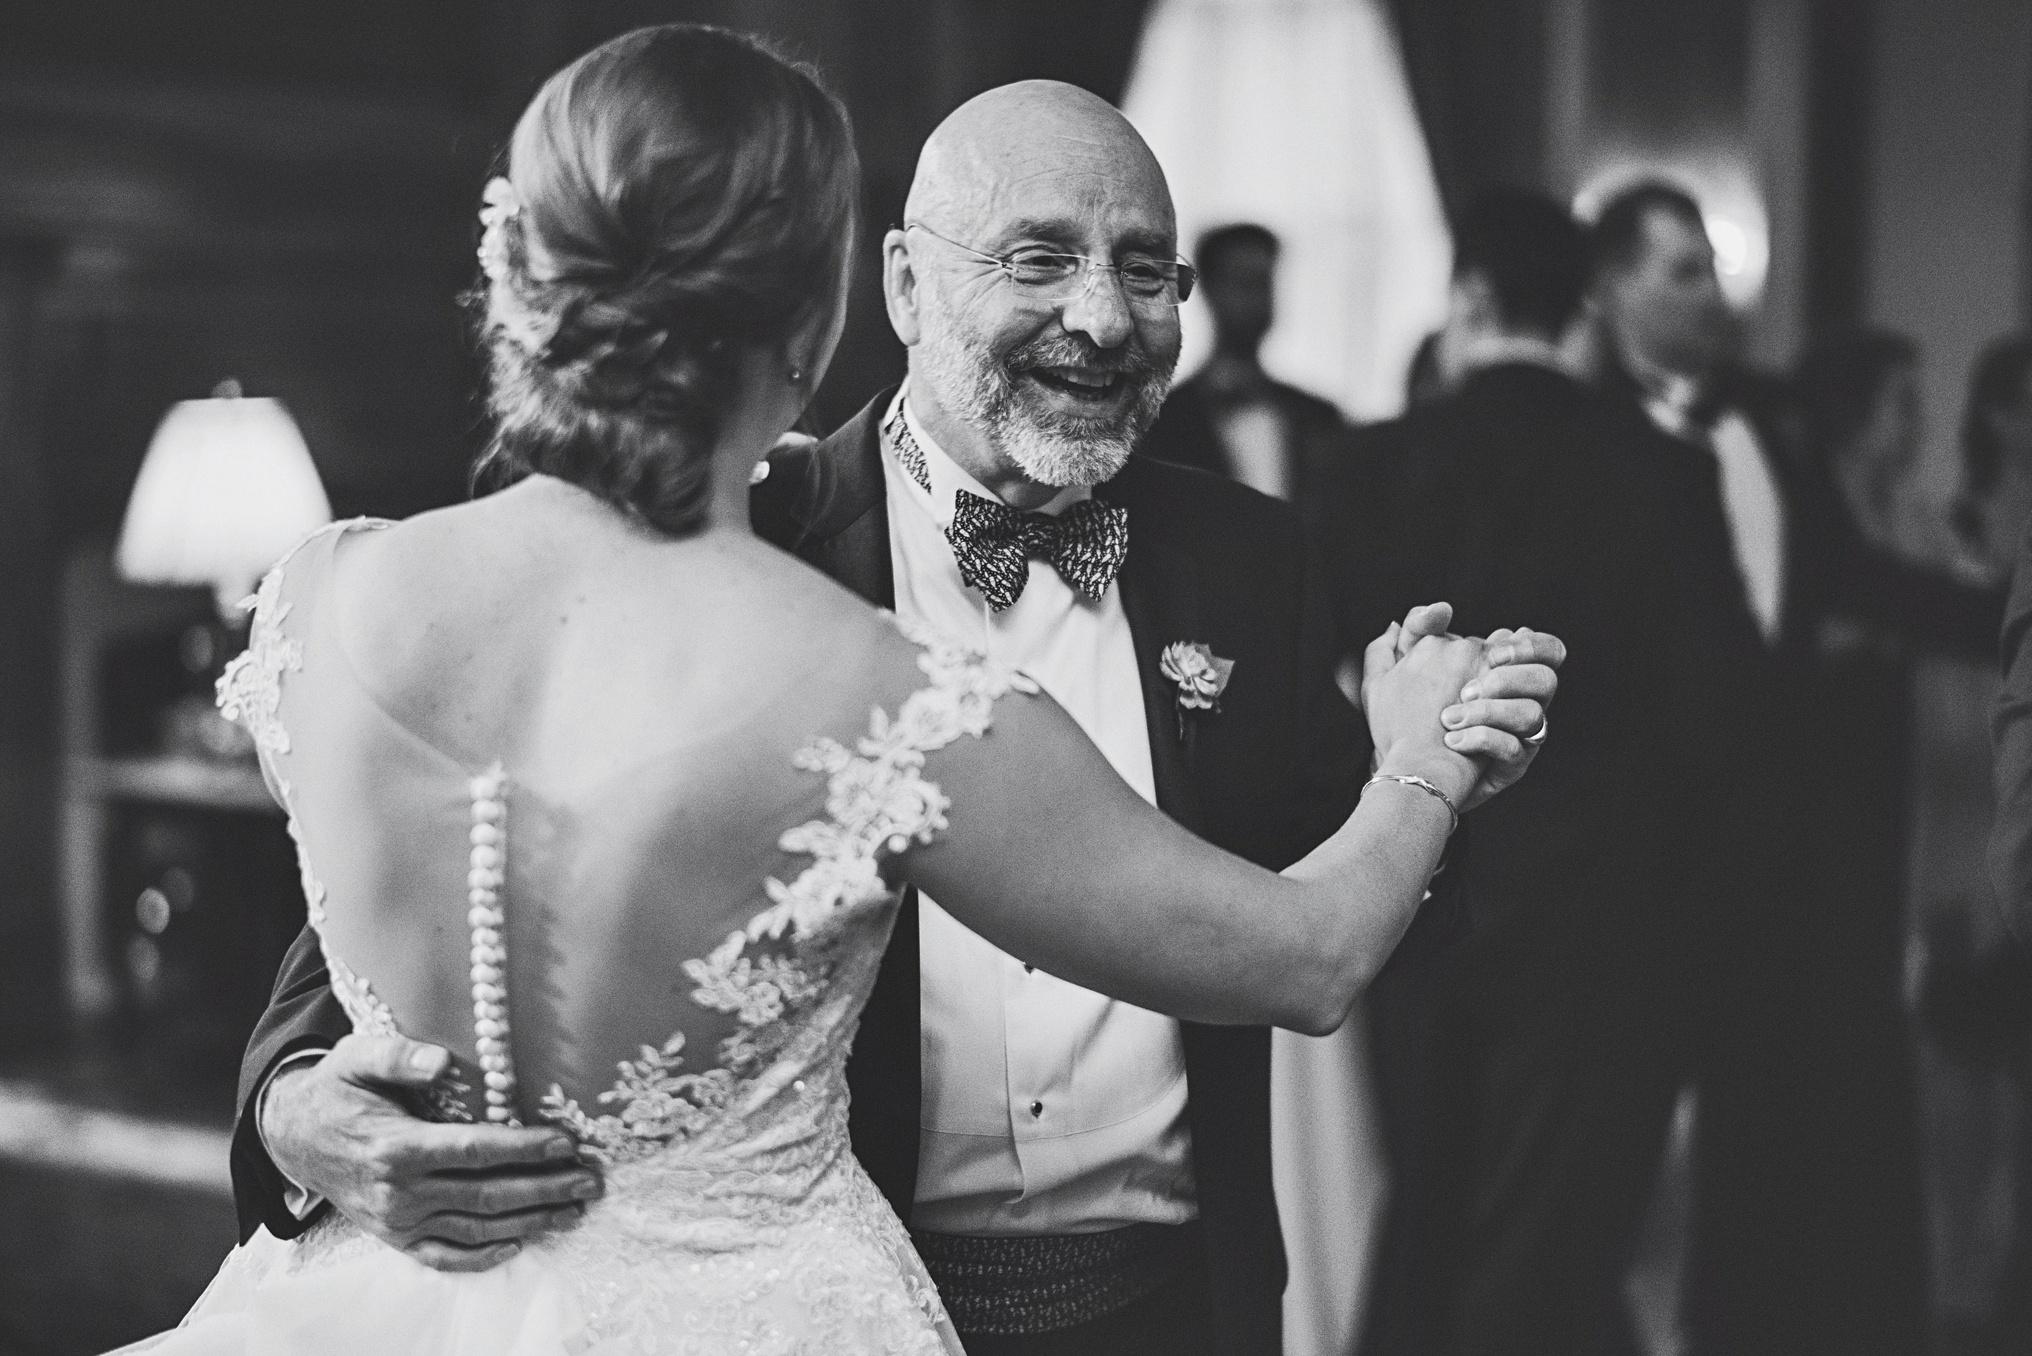 best_wedding_photography_2017_by_lucas_botz_photography_181.jpg